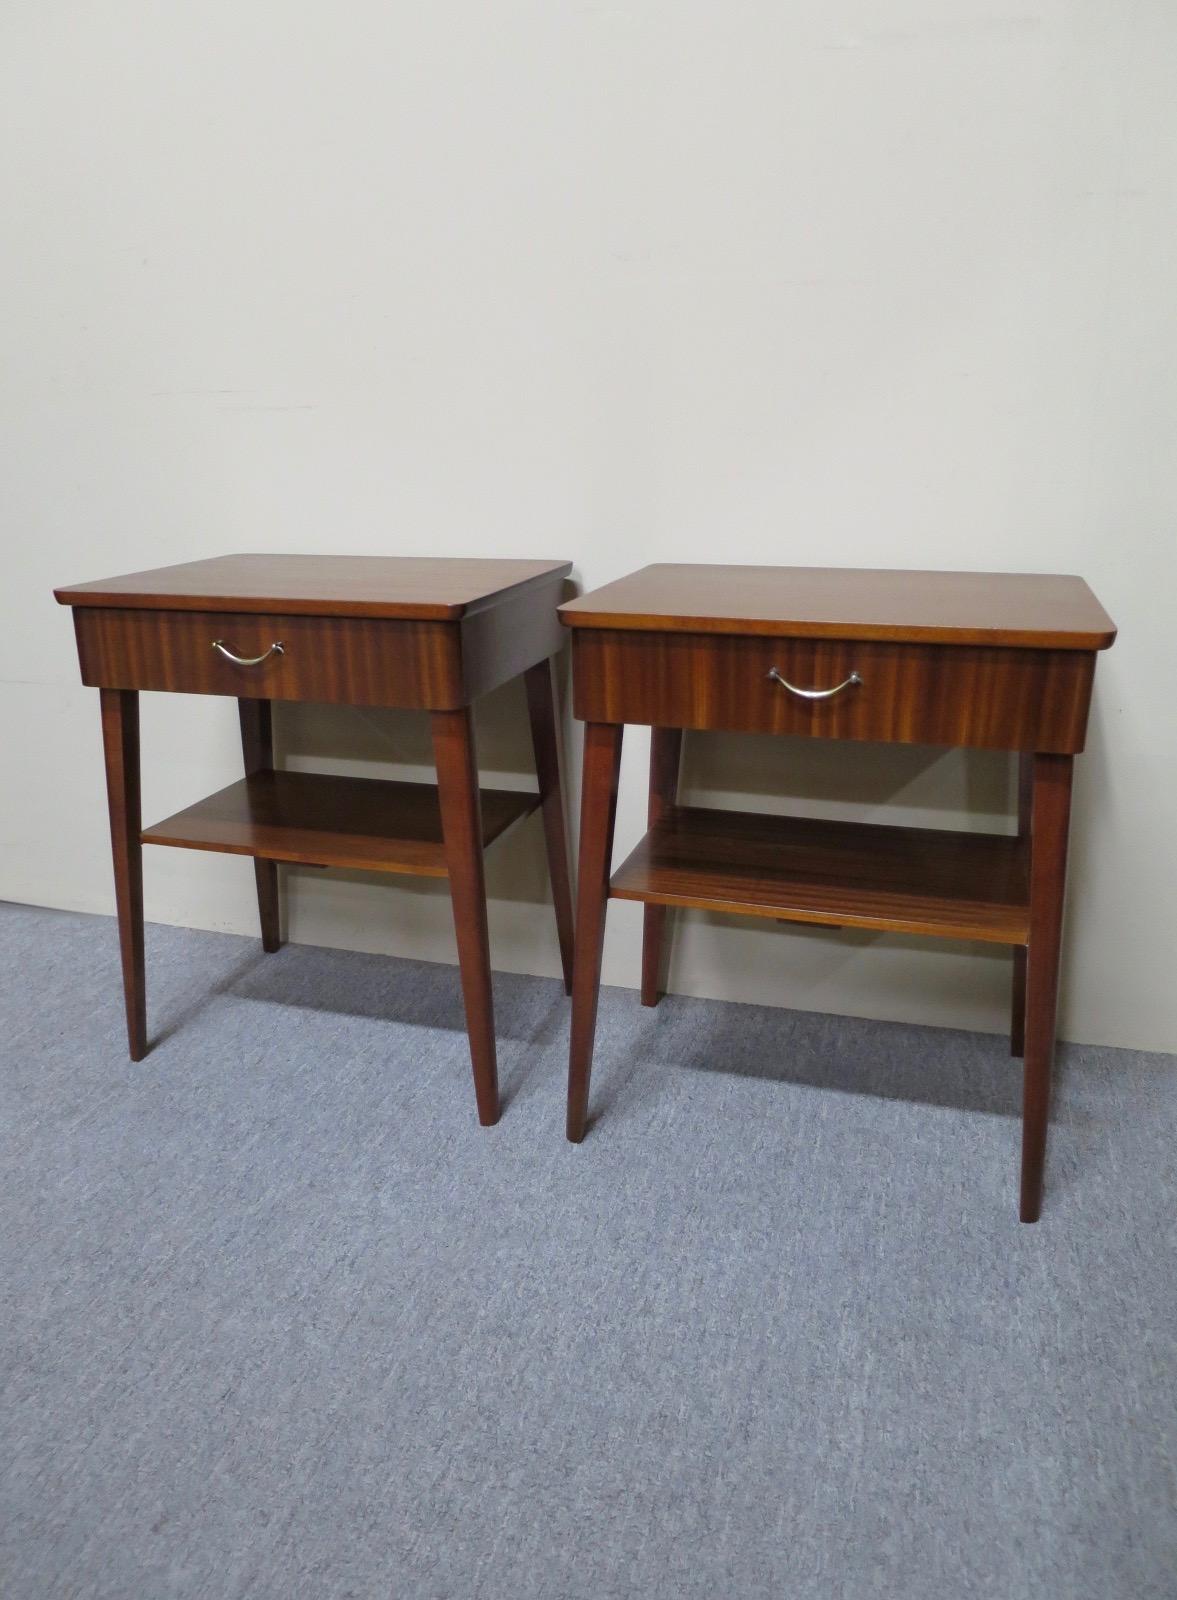 Picture of: Buy Online Pair Of Mid 20th Century Teak Bedside Tables Australian Antique Shop Nostalgia Antiques